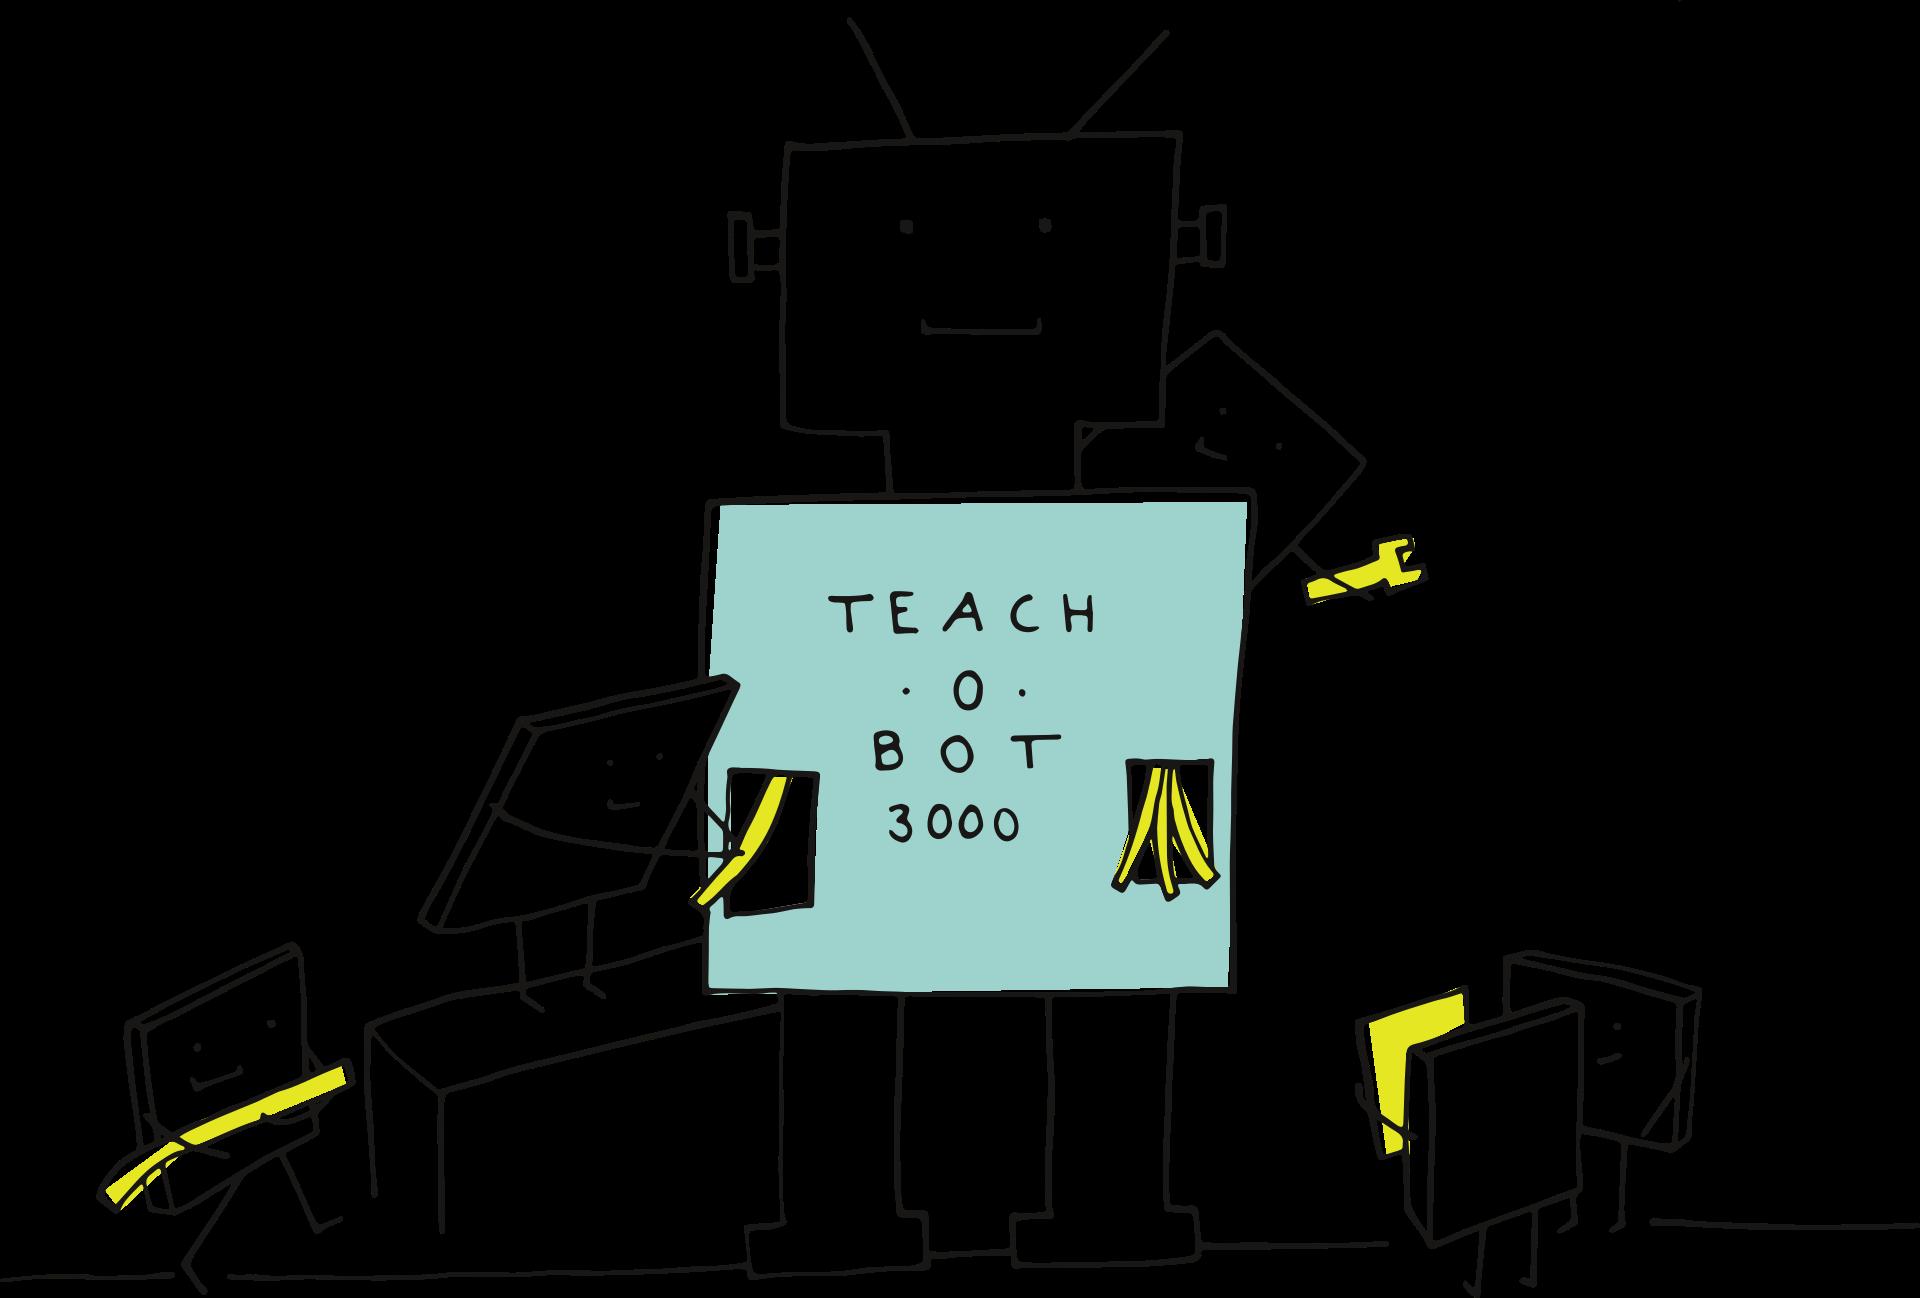 teach-o-bot.png